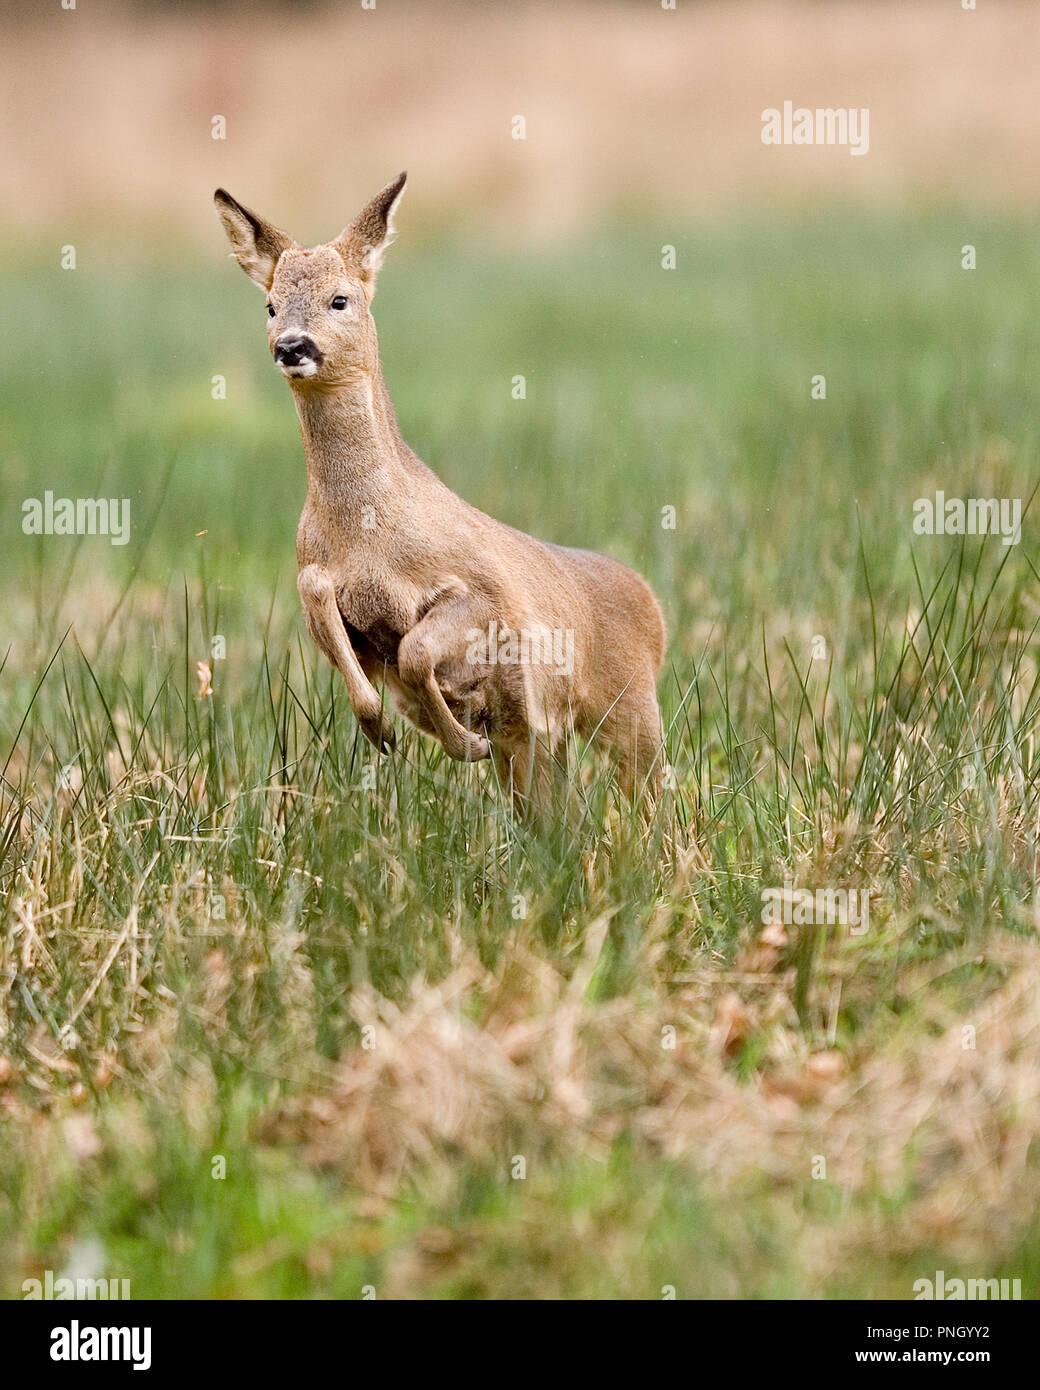 roe deer Capreolus capreolus - Stock Image